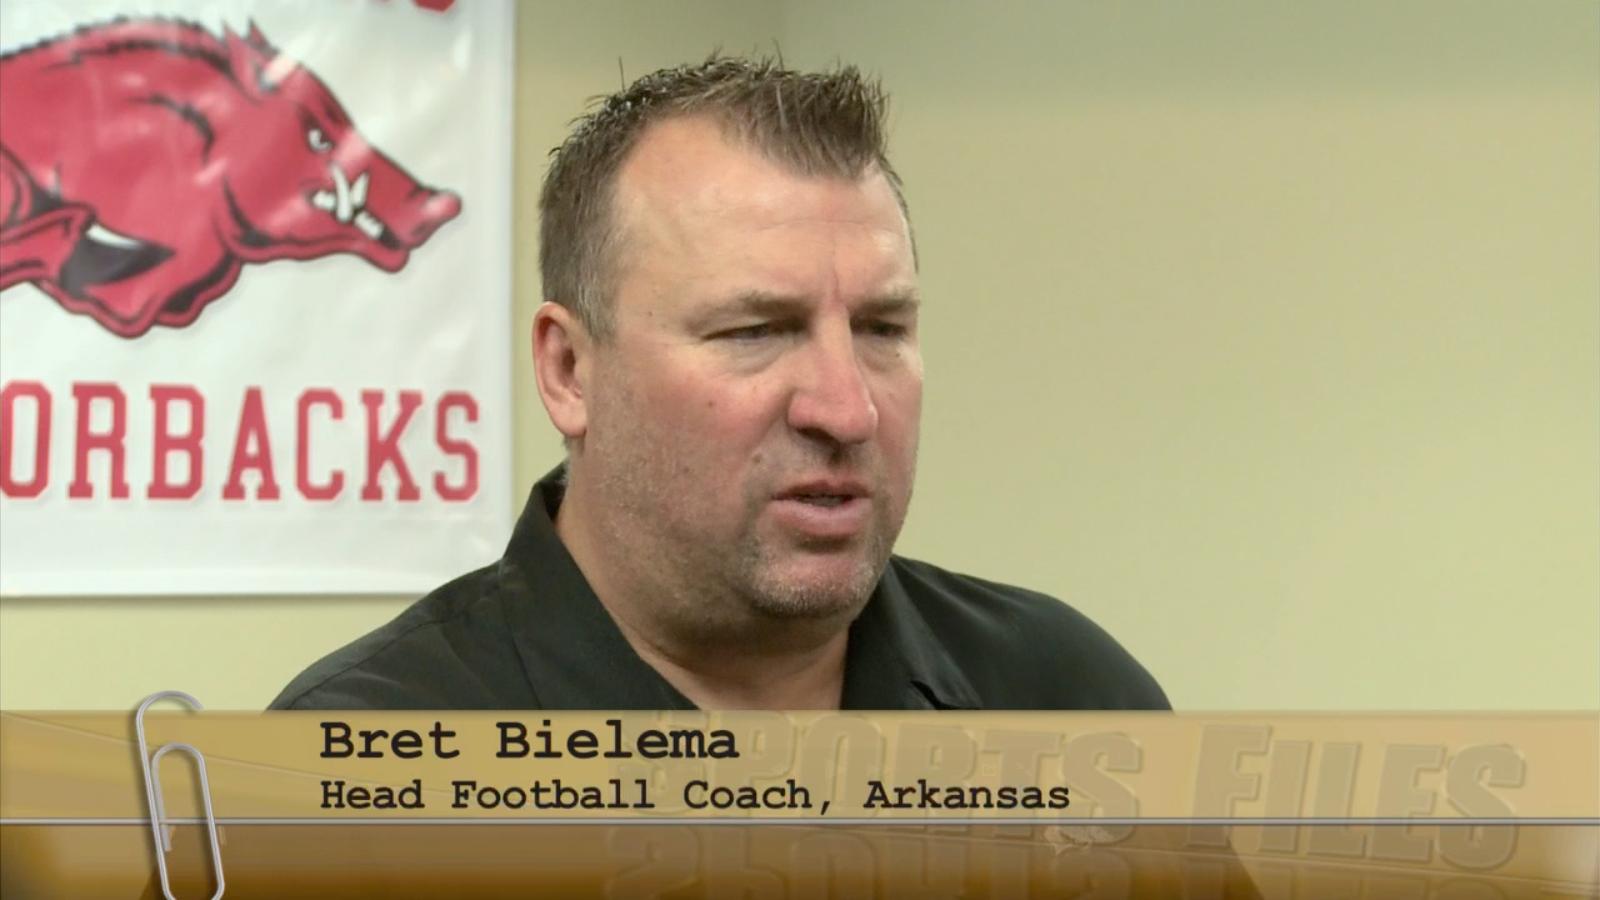 arkansas razorbacks head football coach bret bielema